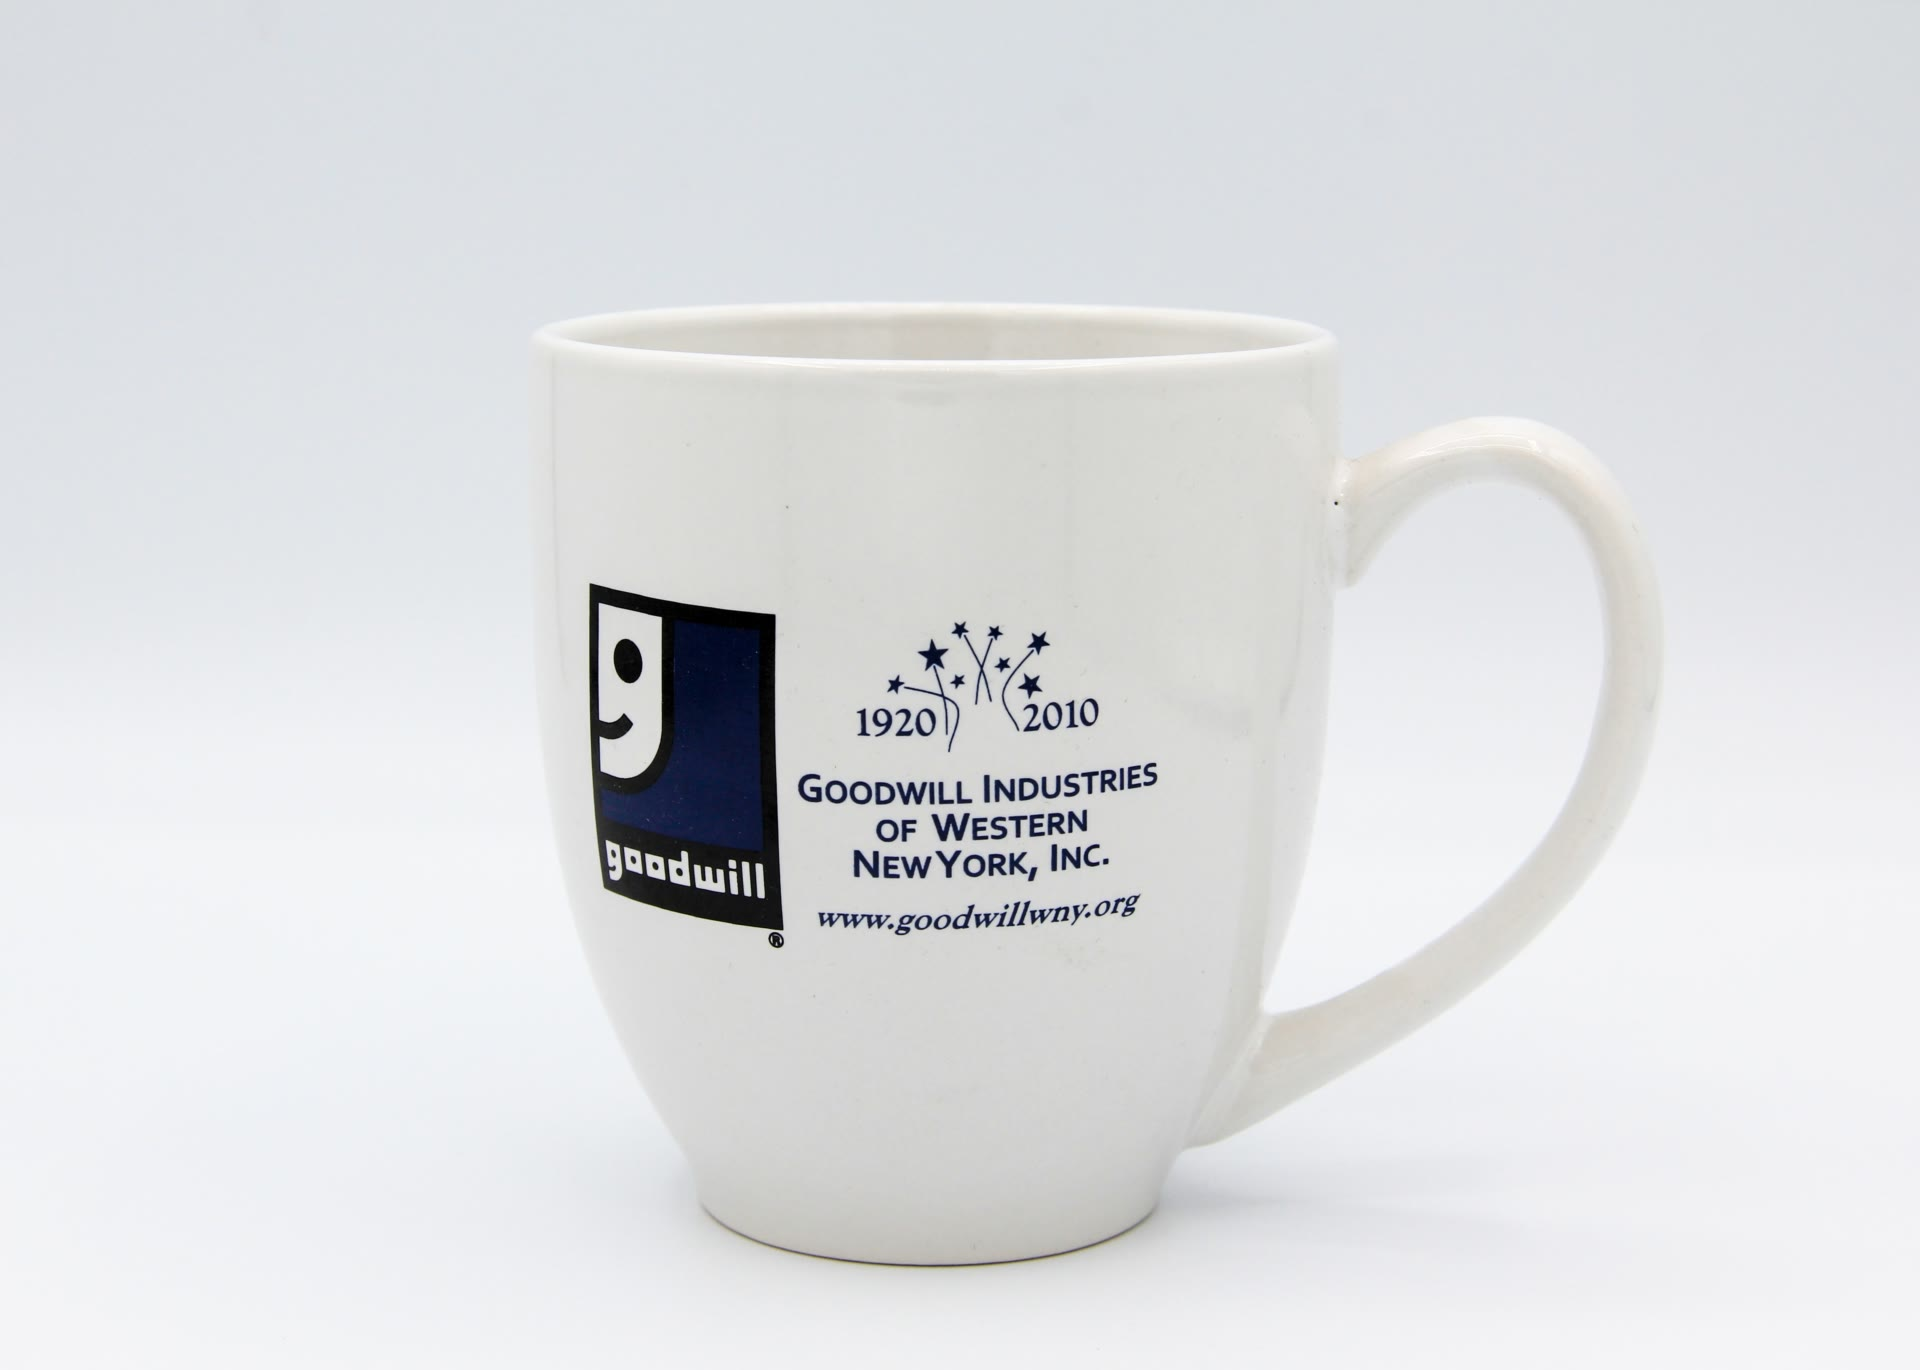 Goodwill Industries of Western New York mug